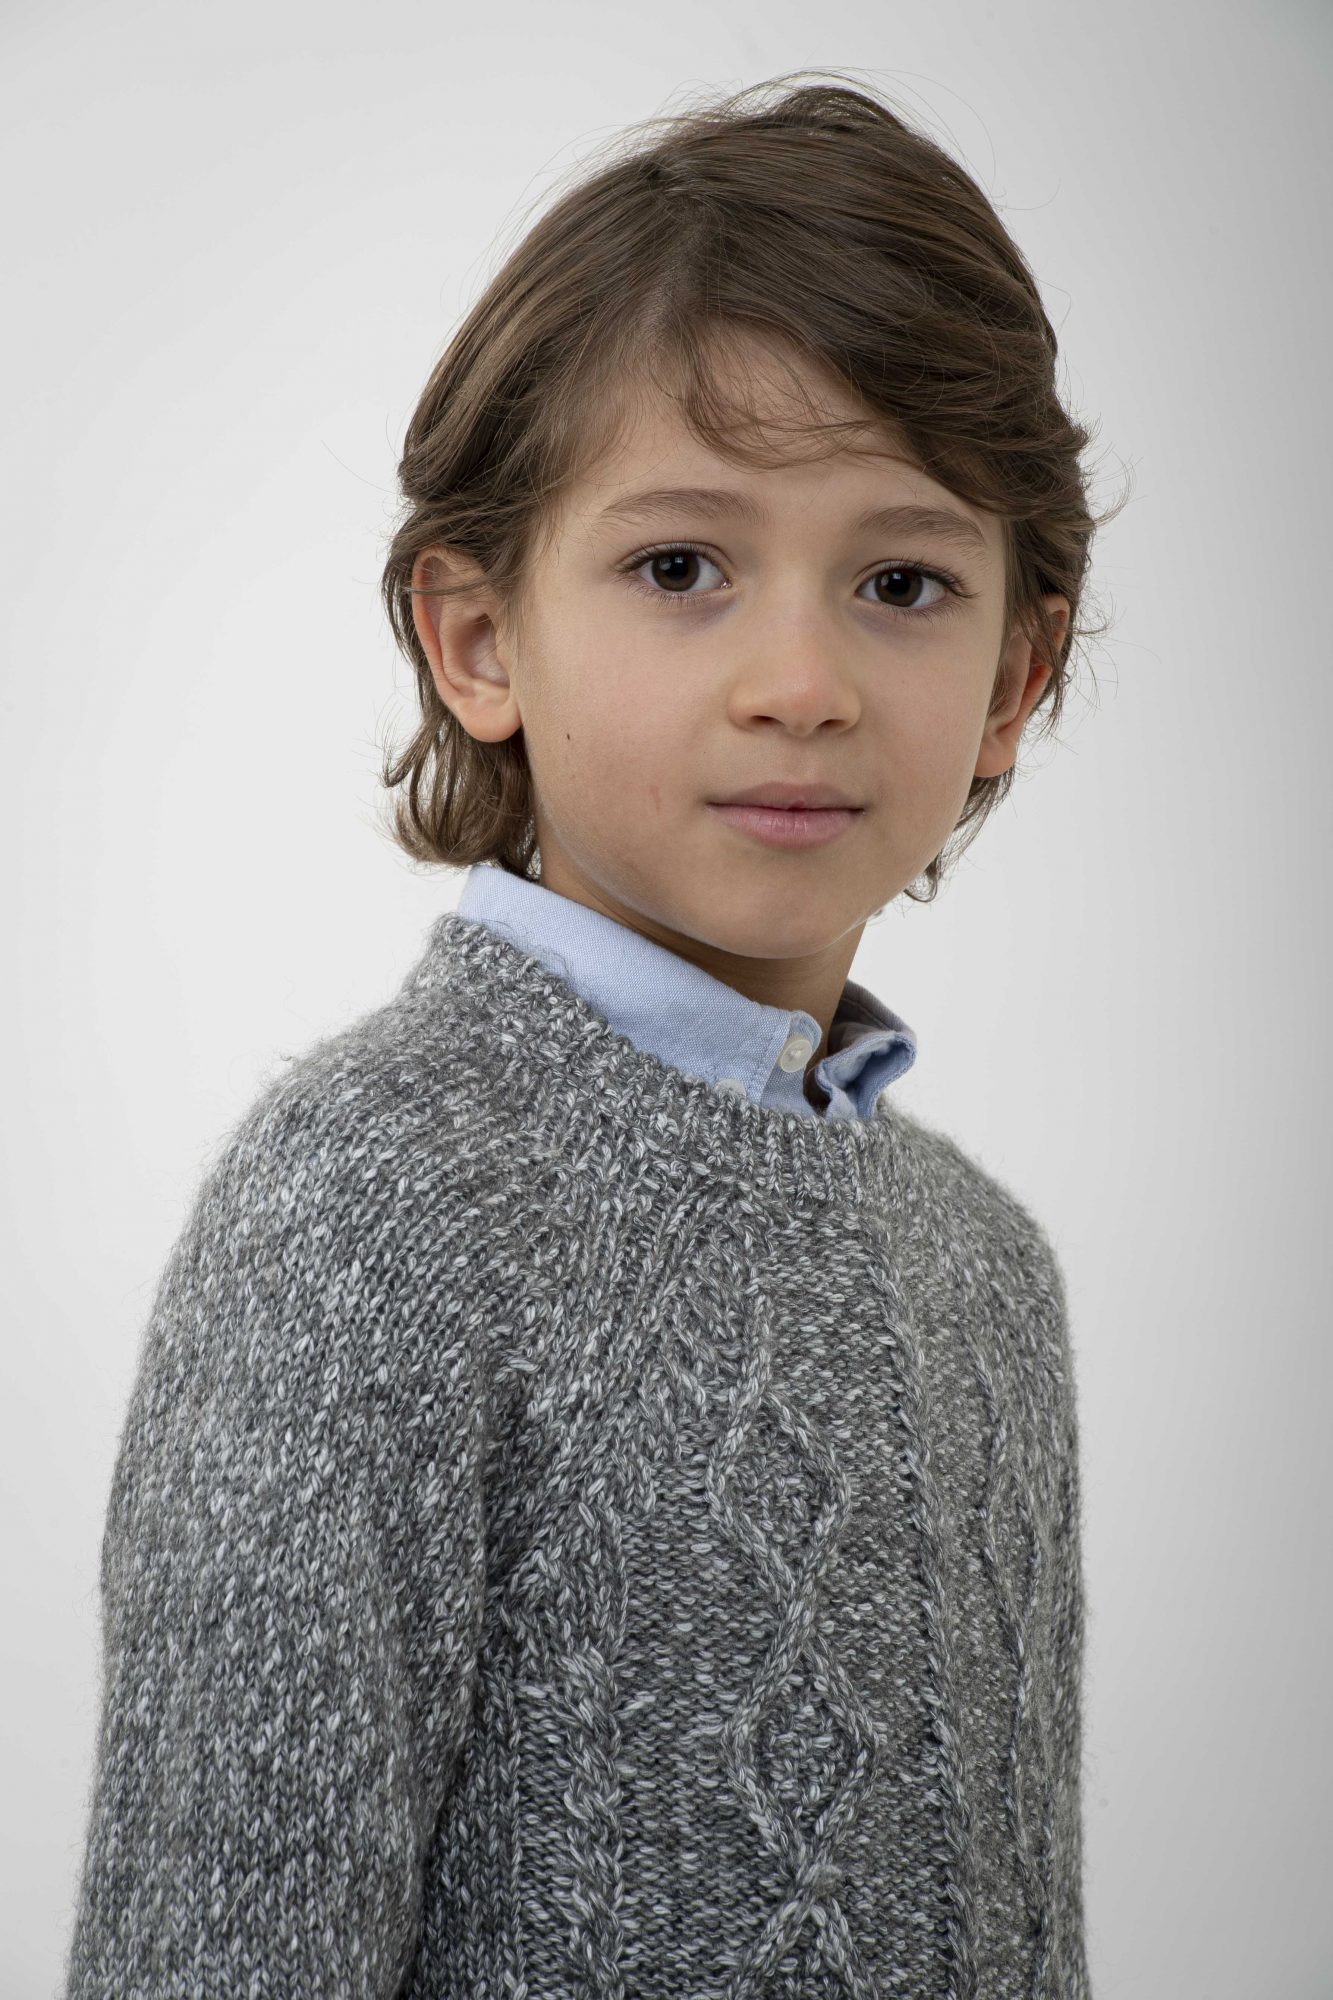 Samuel Ledezma